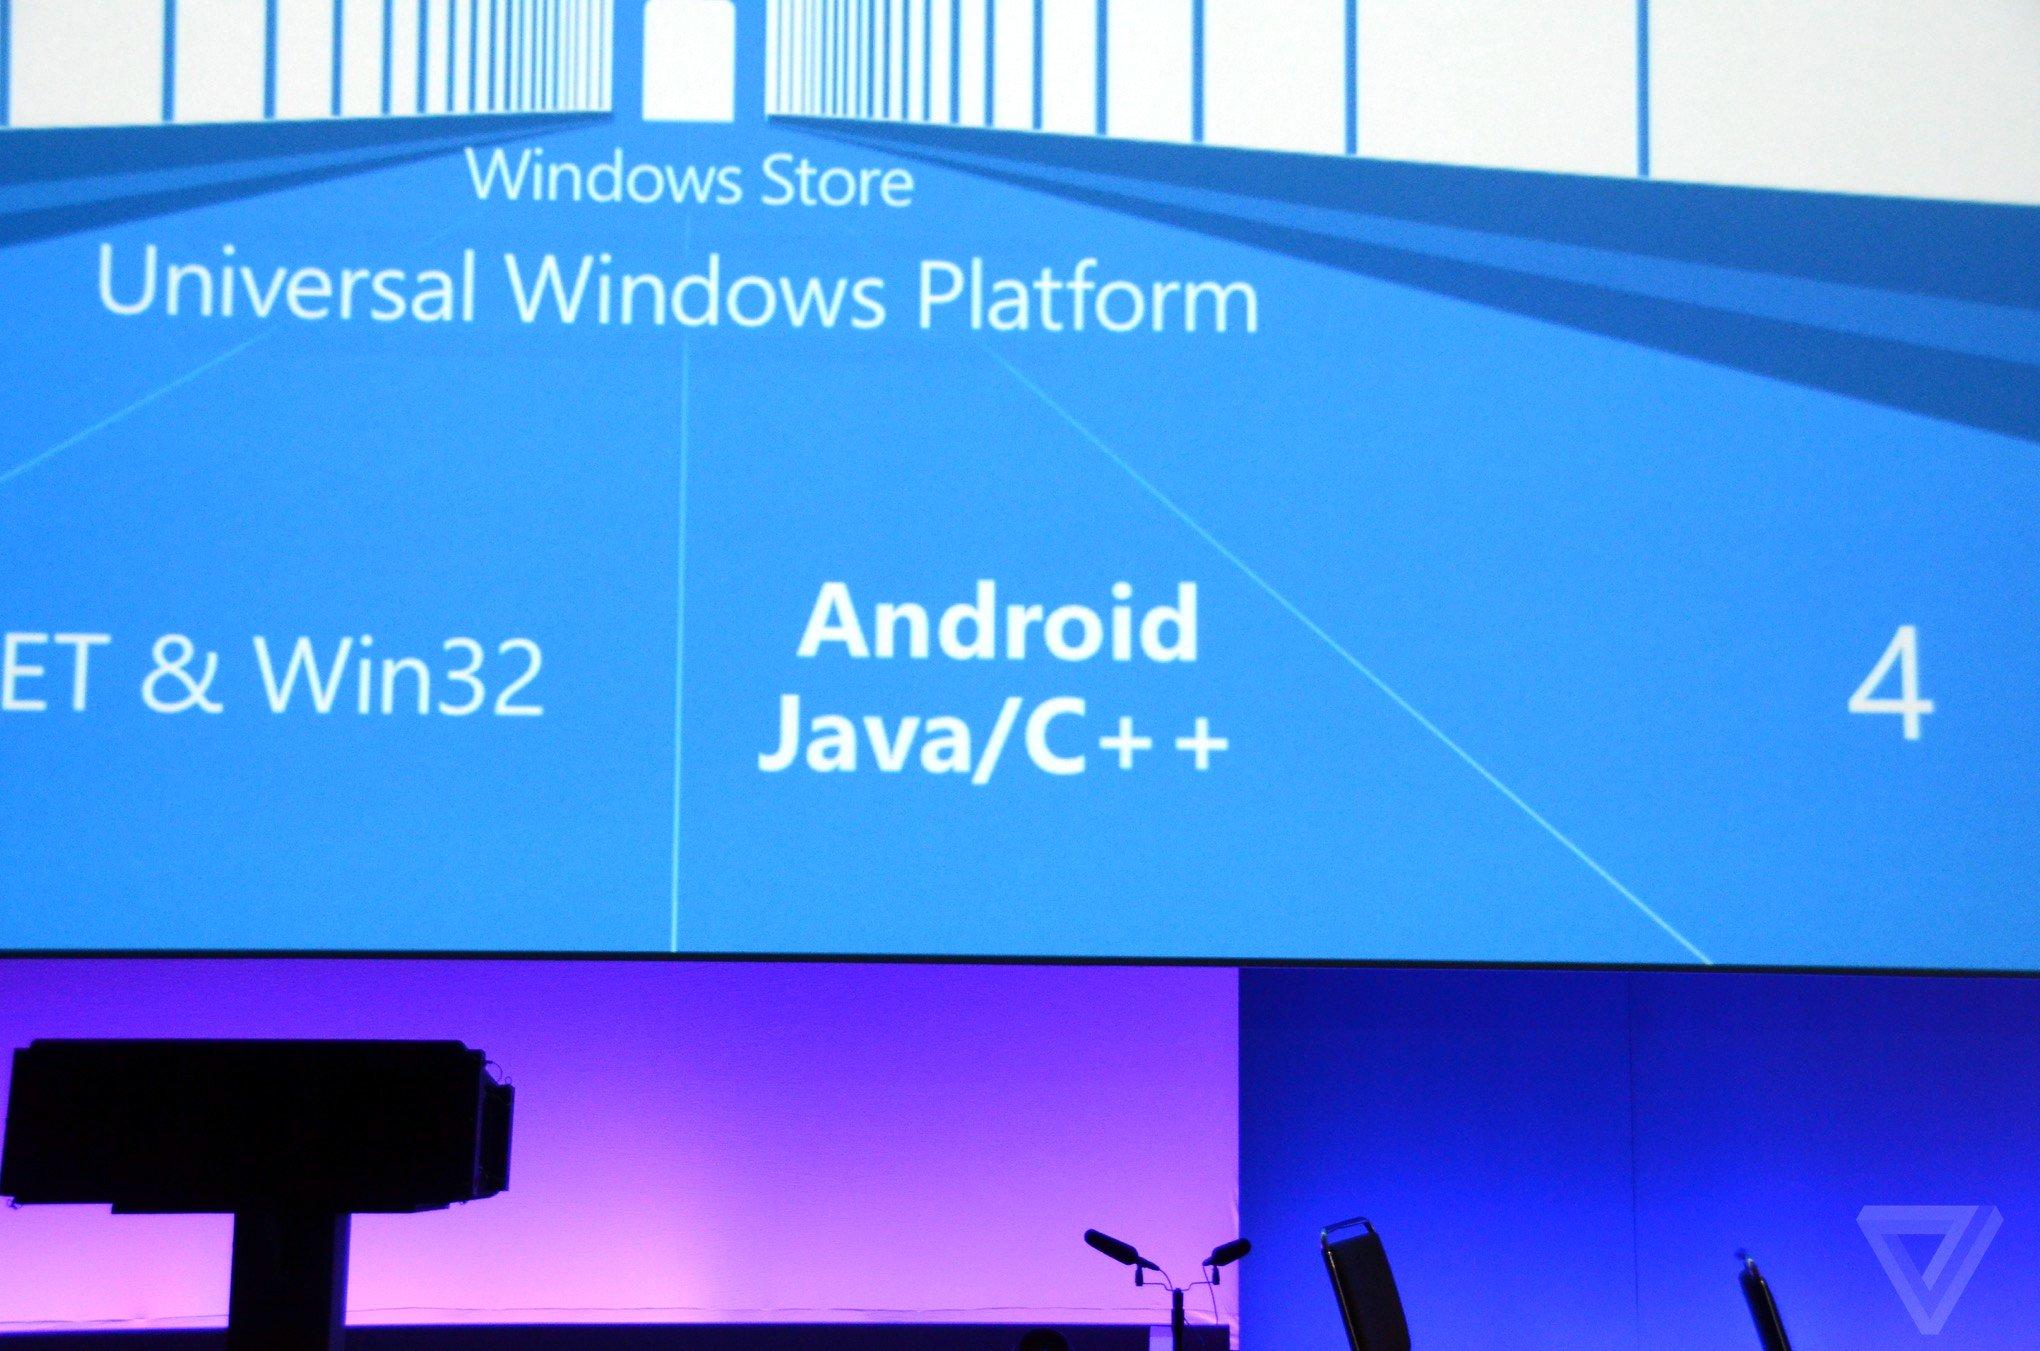 Windows 10 runs Android app